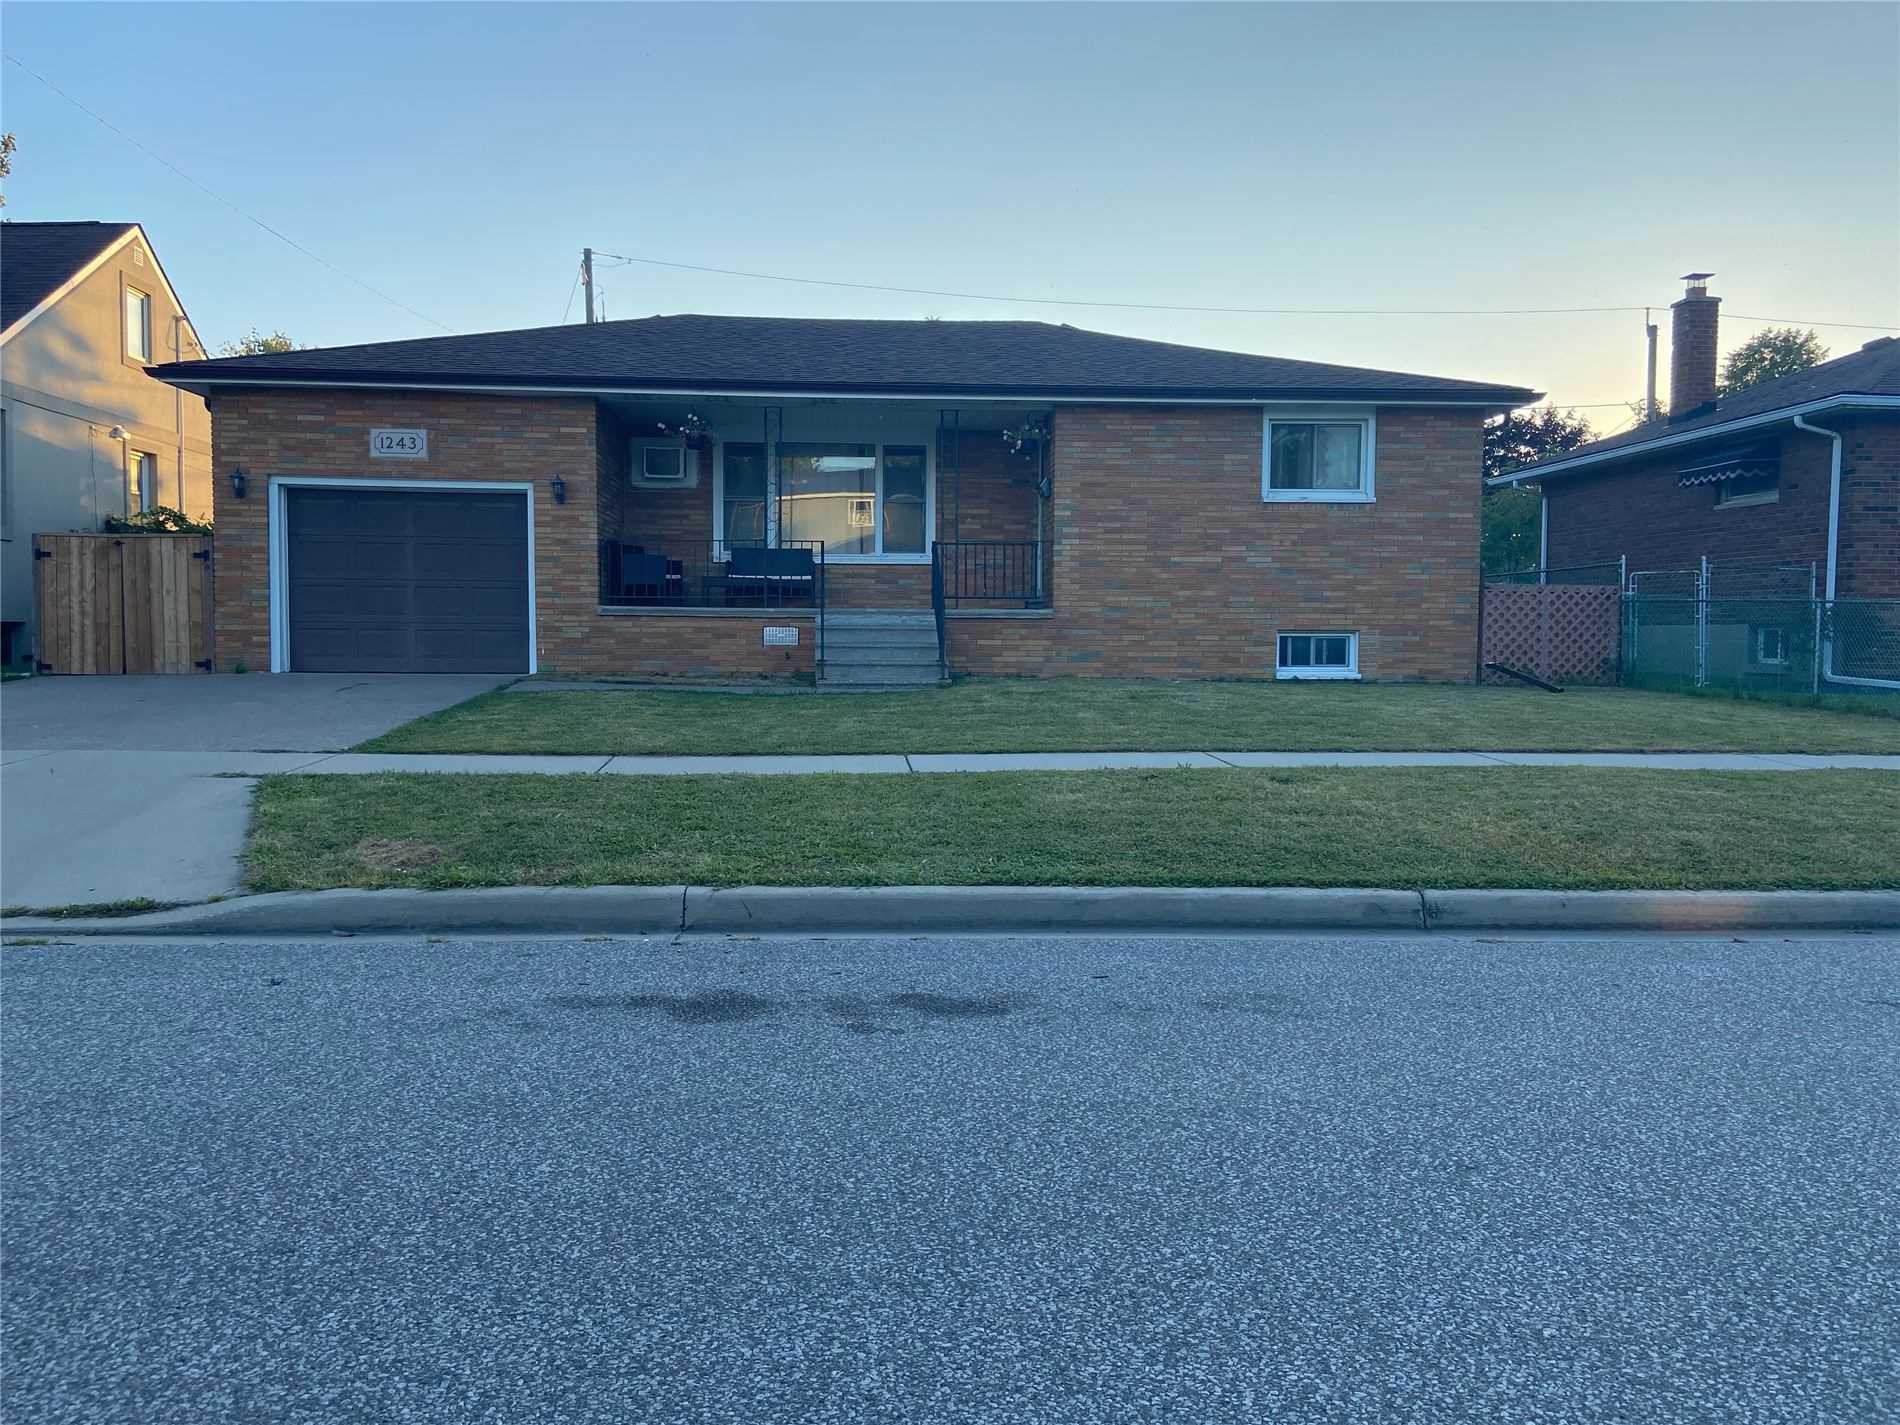 1243 Westcott St, Windsor, Ontario N8Y 4B9, 3 Bedrooms Bedrooms, ,2 BathroomsBathrooms,Detached,For Sale,Westcott,X5366283